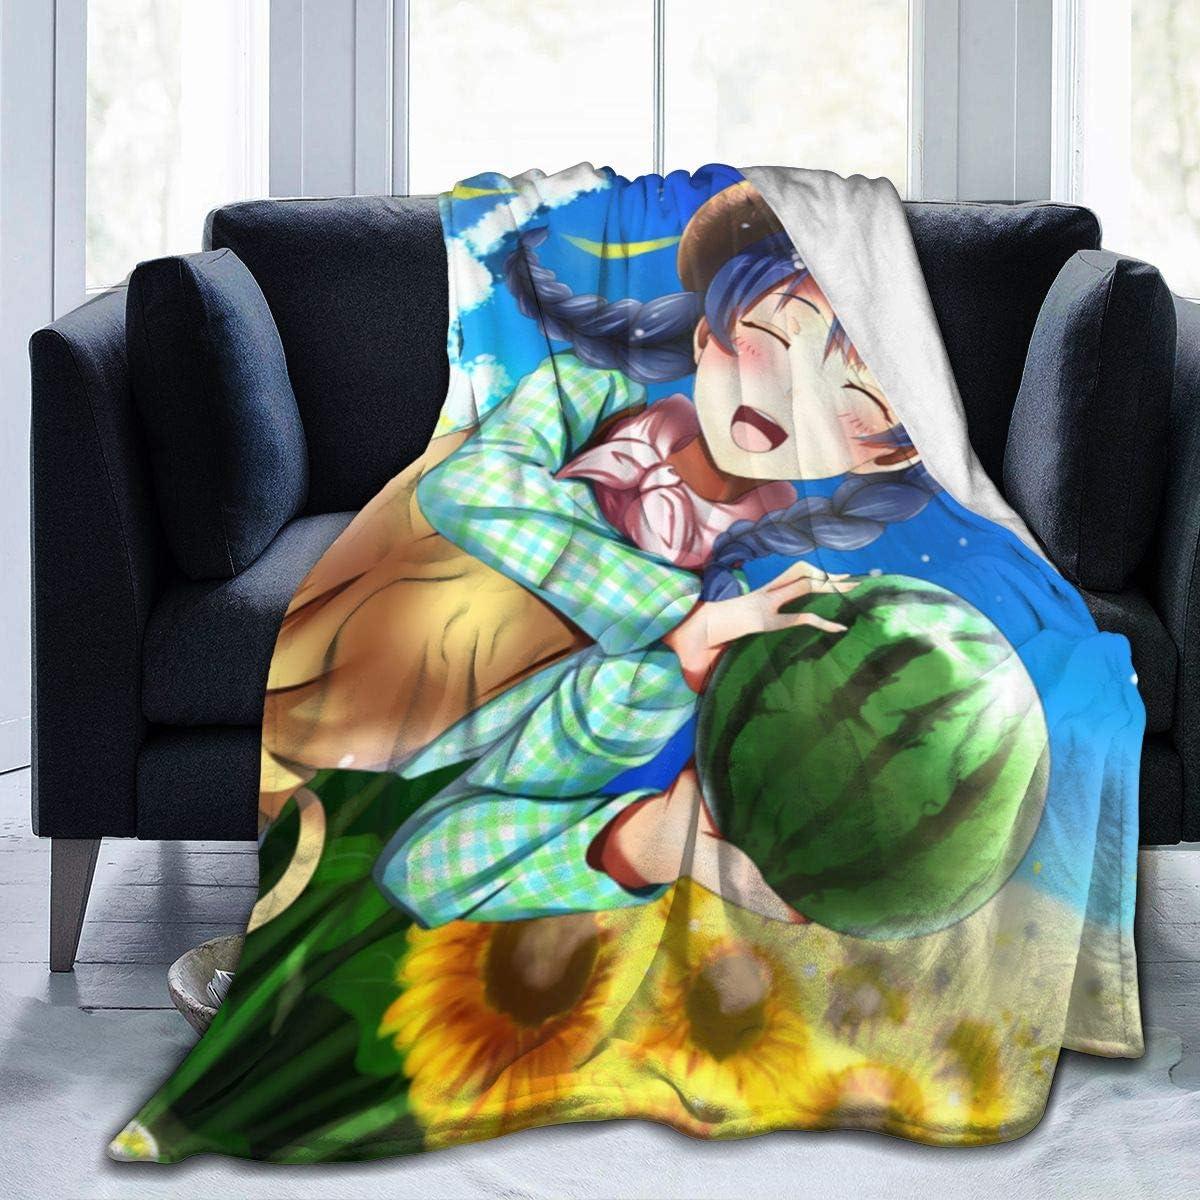 JAIDEN BEATA Nice Fleece Bed Blankets,Food Wars Shokugeki No Soma Megumi Tadokoro Throw Blankets,All Seasons Super Soft 80s 90s Blanket for Girls Better Relaxing Bedroom